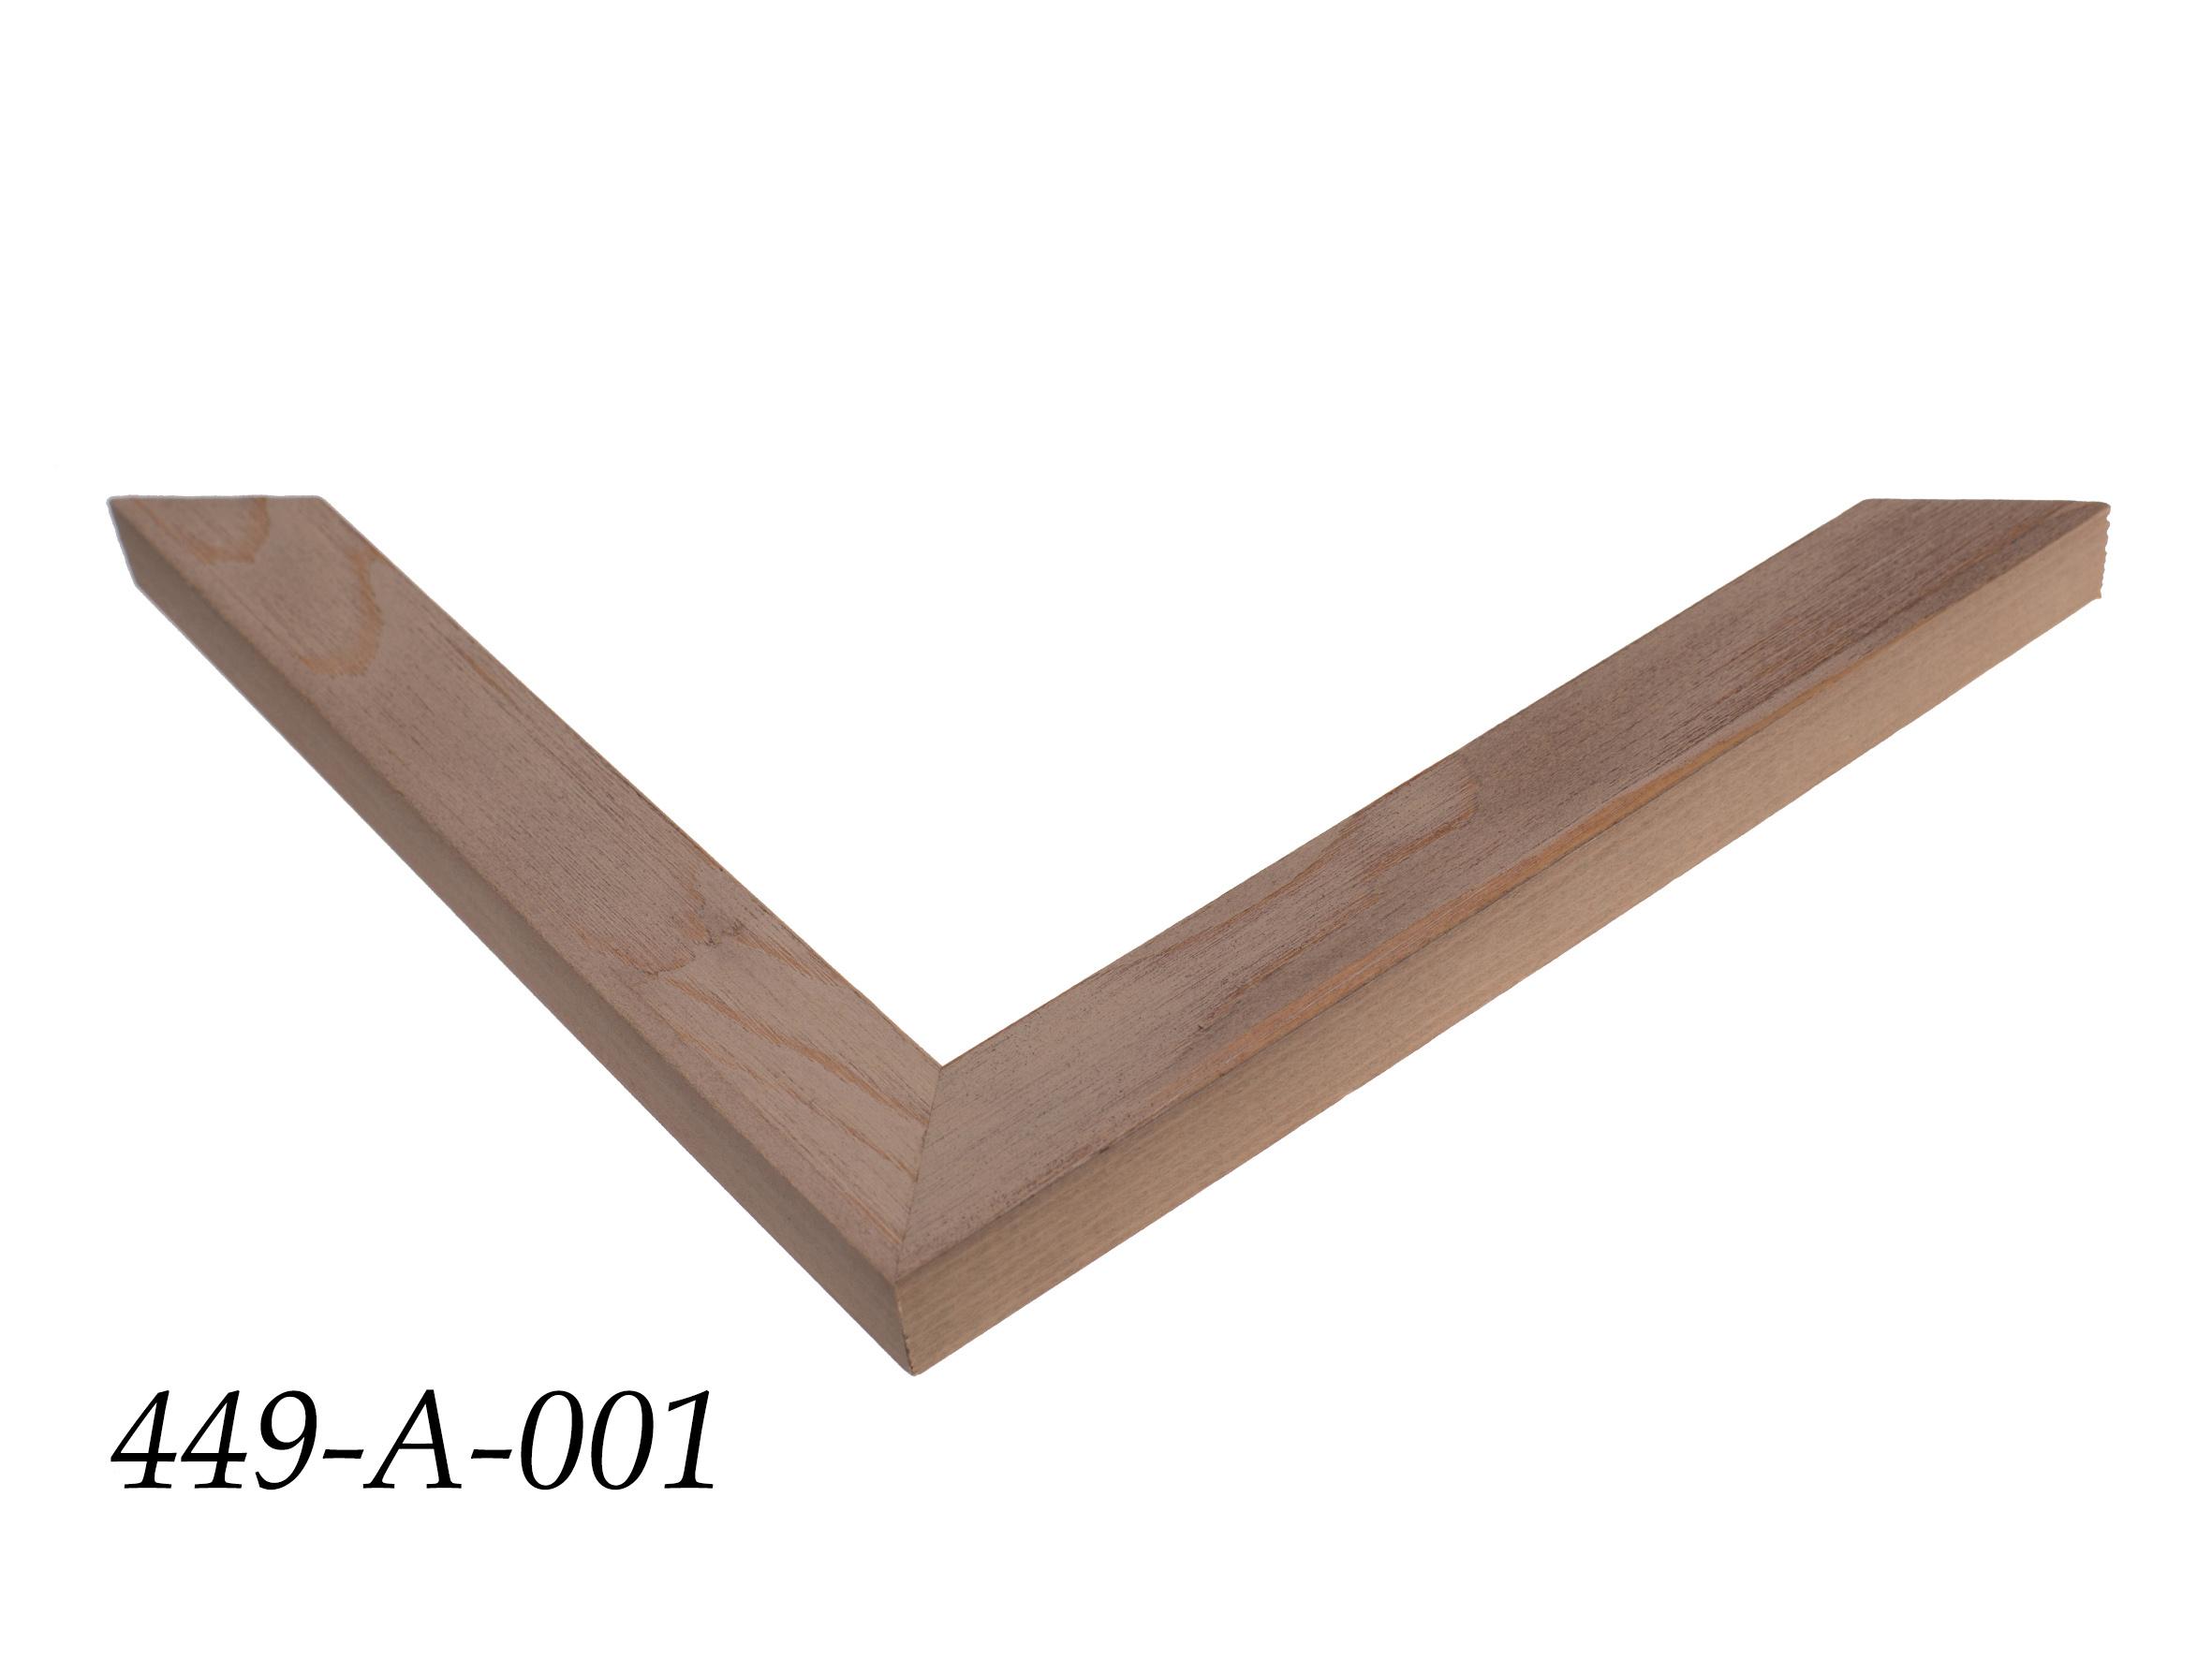 449-A-001